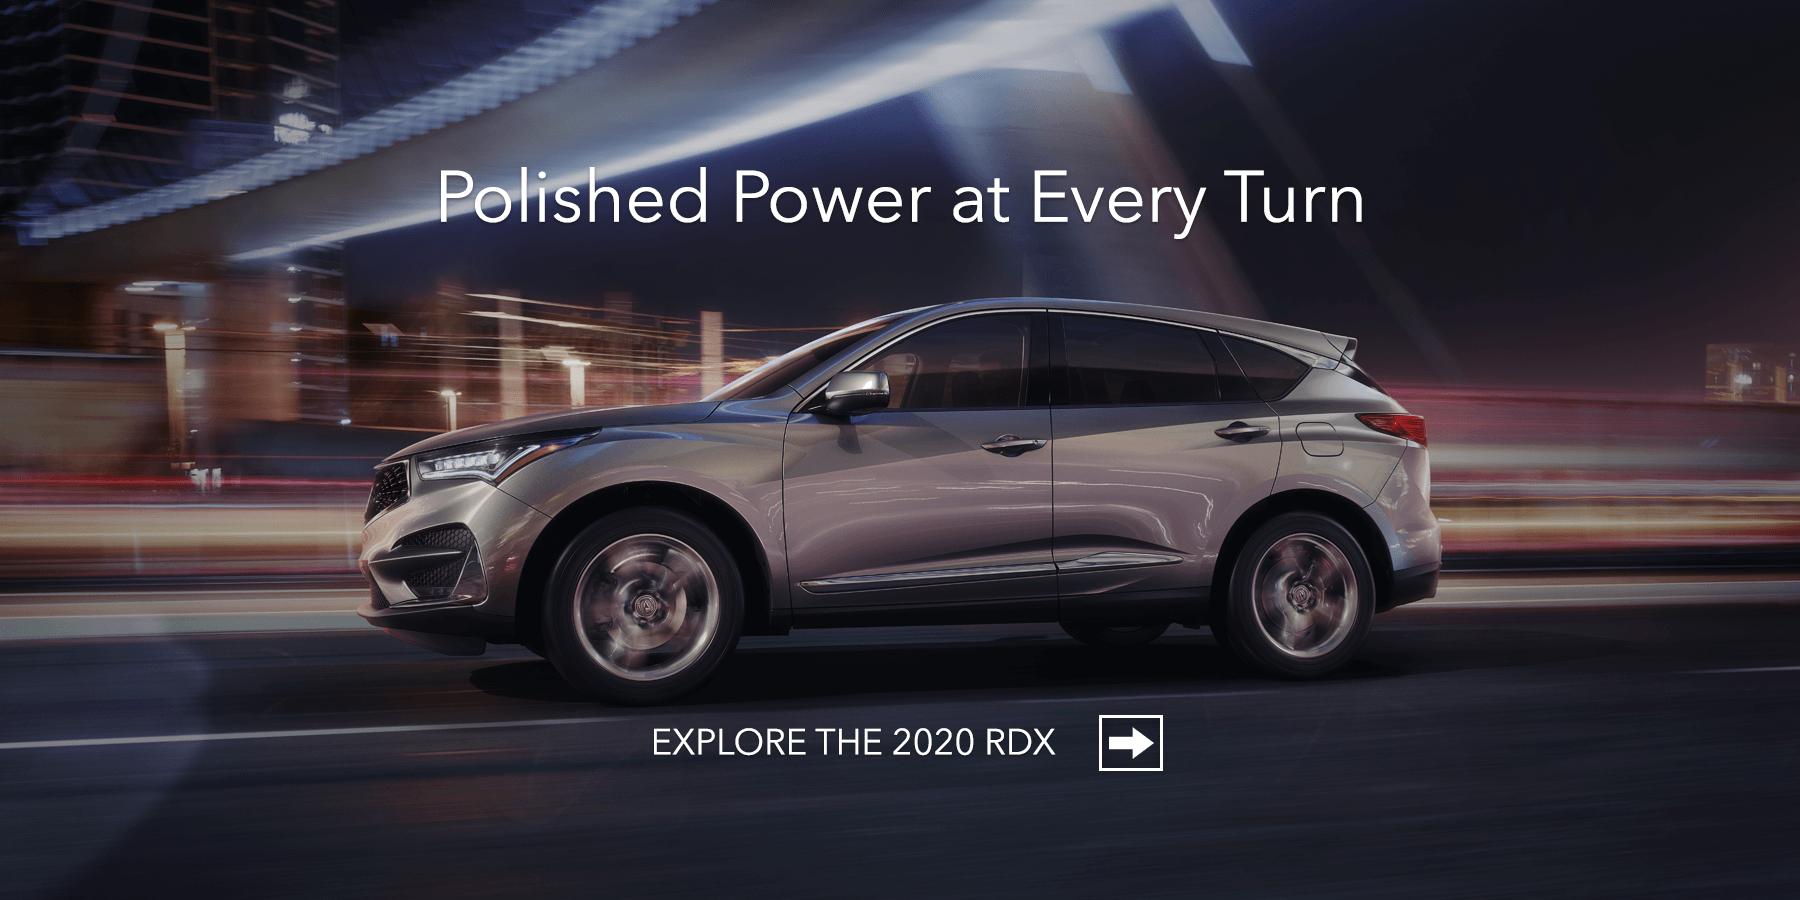 2020 Acura RDX Lunar Silver Metallic Side Profile Night HP Slide